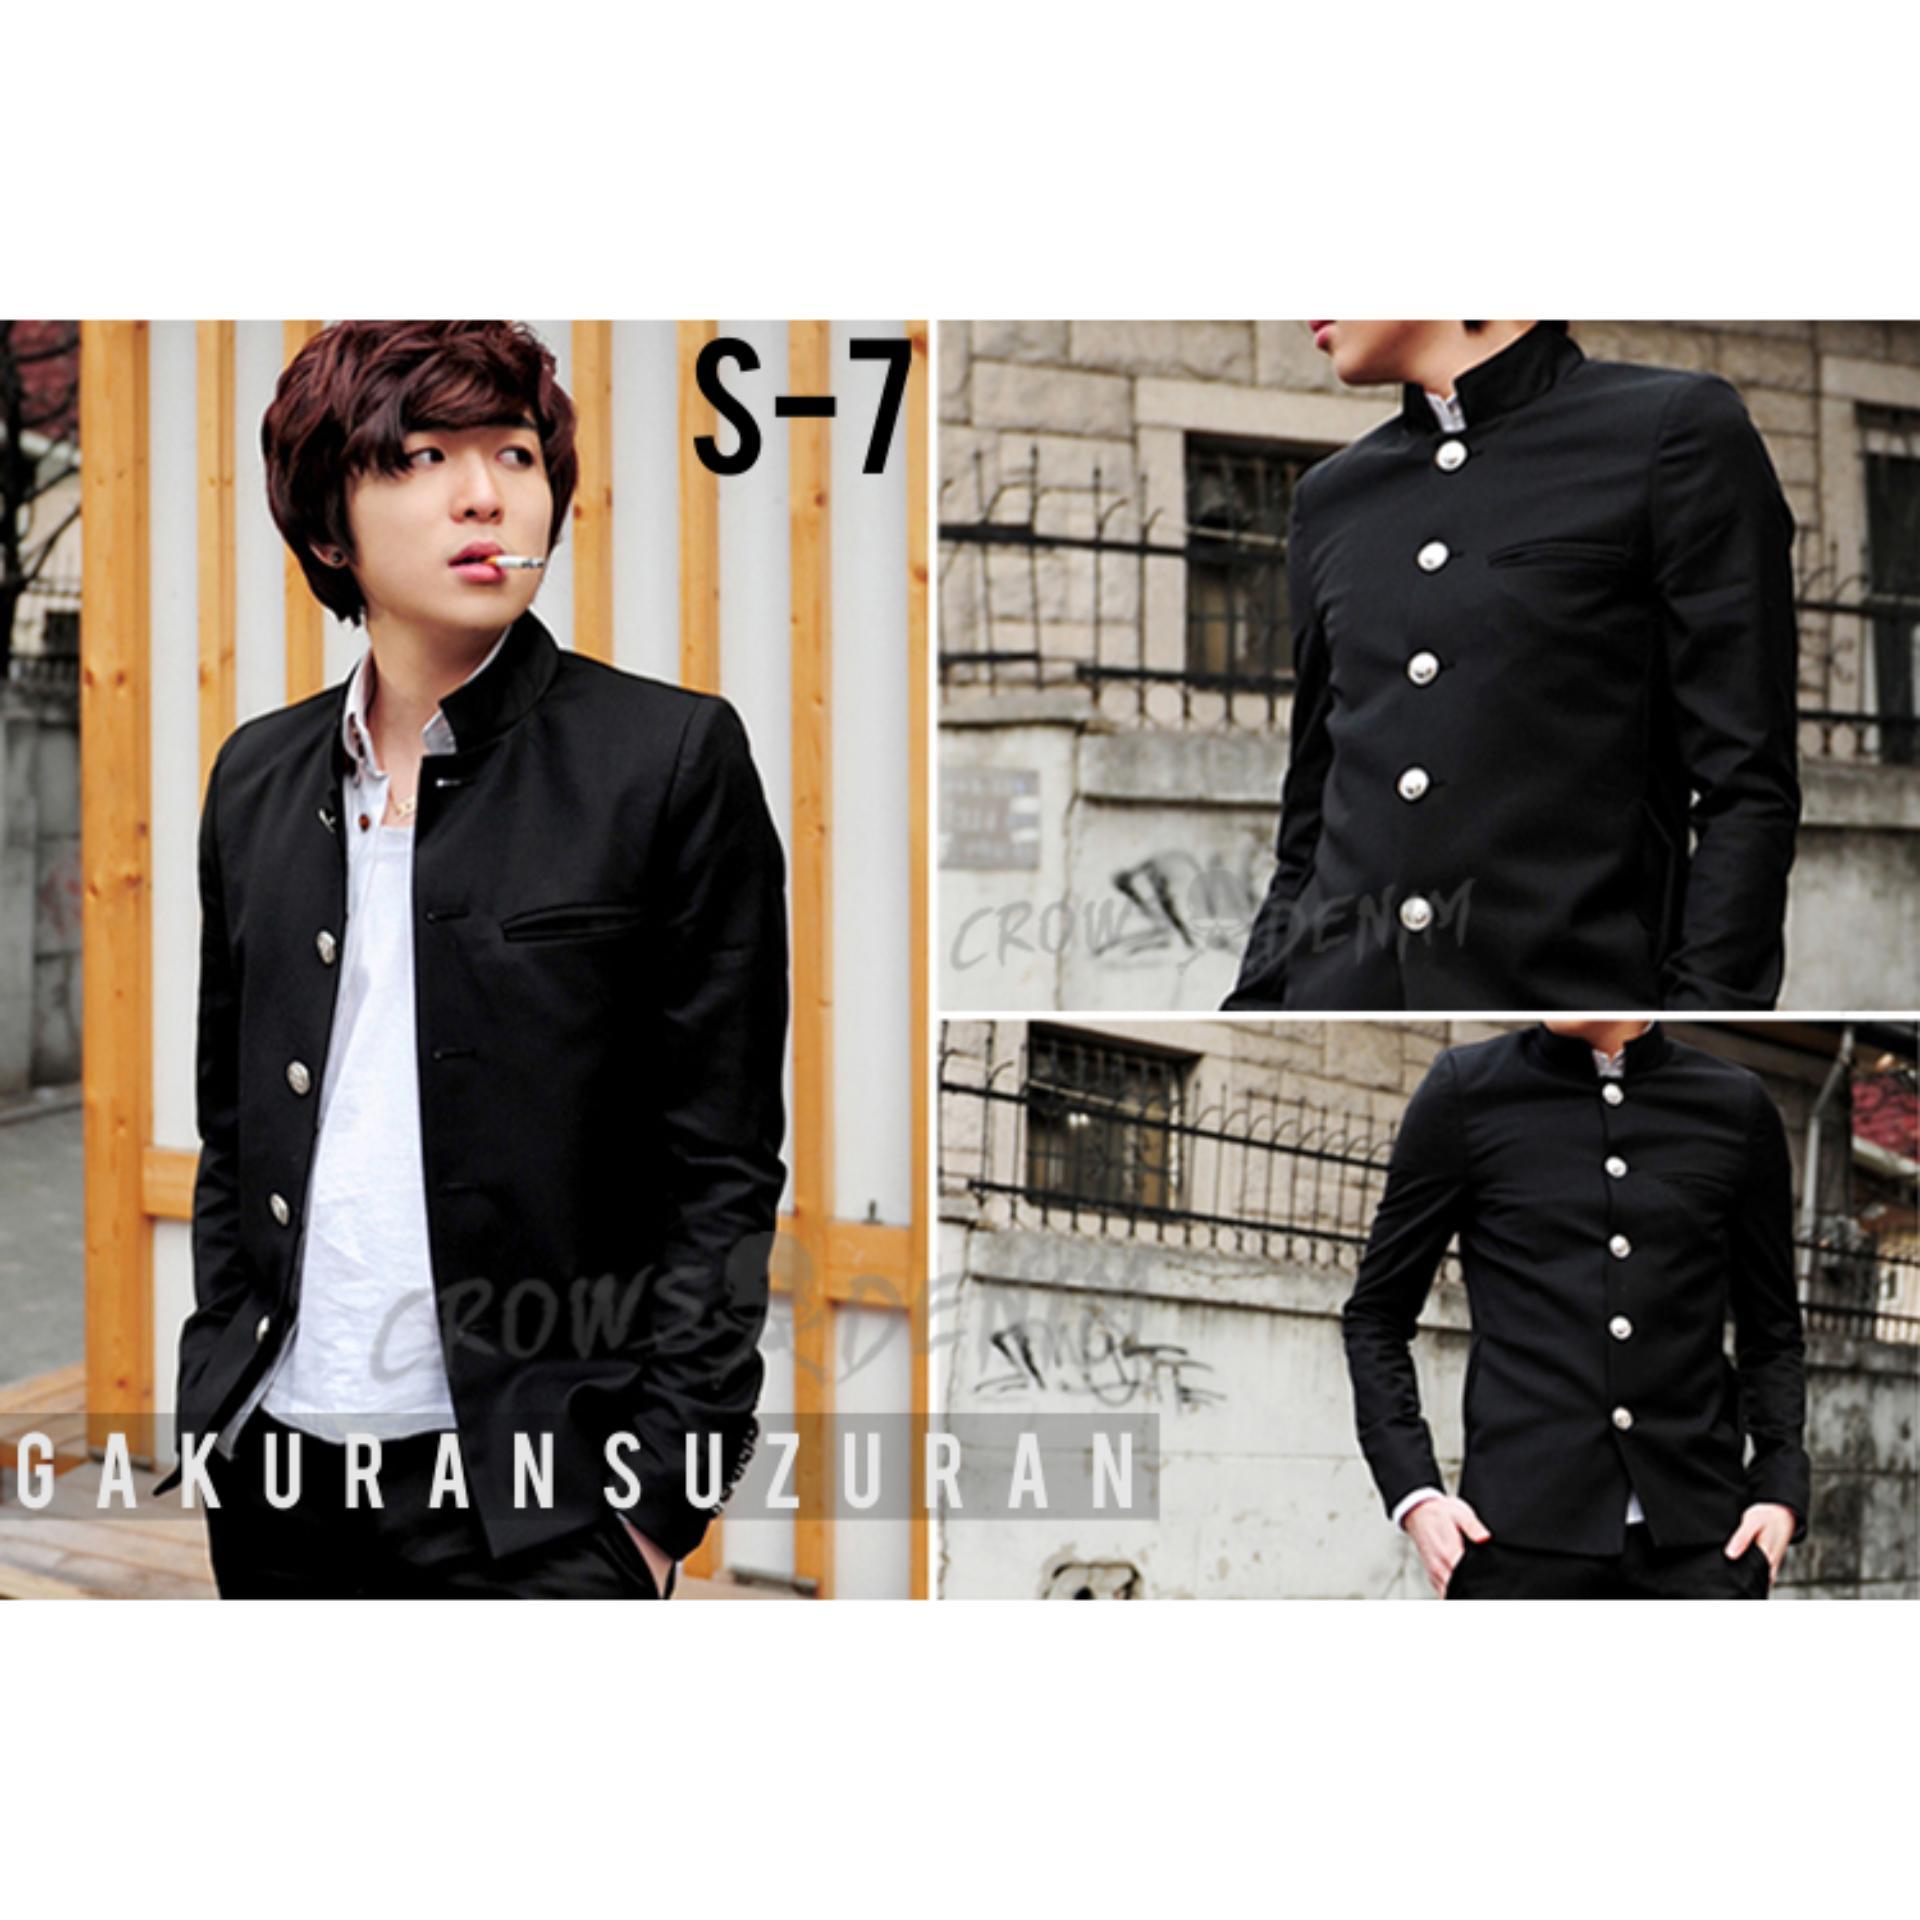 Azure Fashion Blazer Arul Navy Atasan Pria Jas Daftar Harga Semi Formal Stretch Grey Blz 723 Flash Sale Exclusive Jacket Gakuran Suzuran